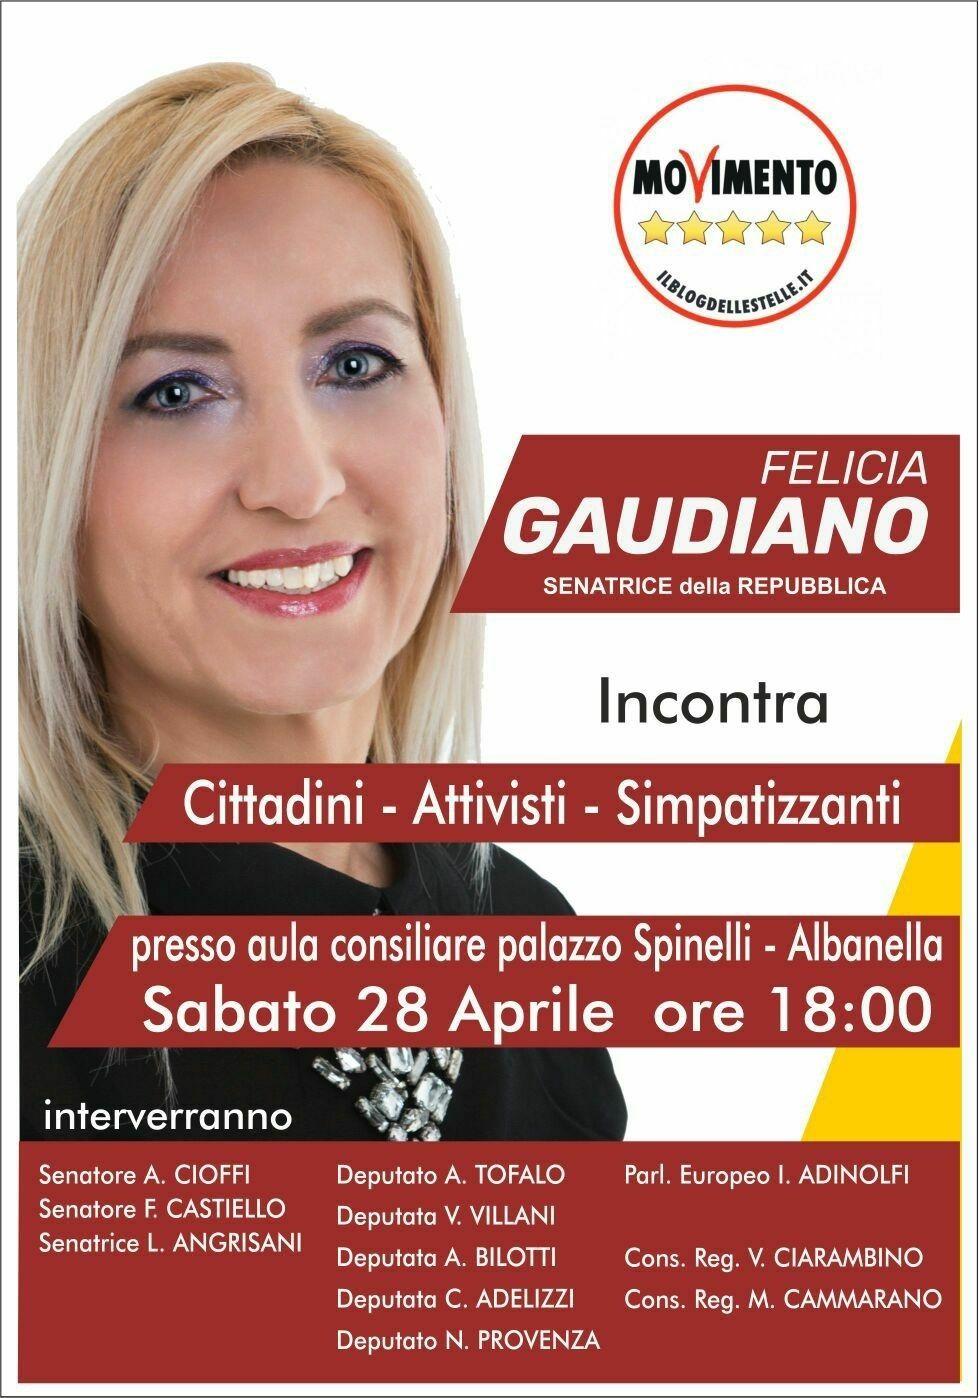 Salerno movimento 5 stelle presenta deputati e senatori for Deputati movimento 5 stelle